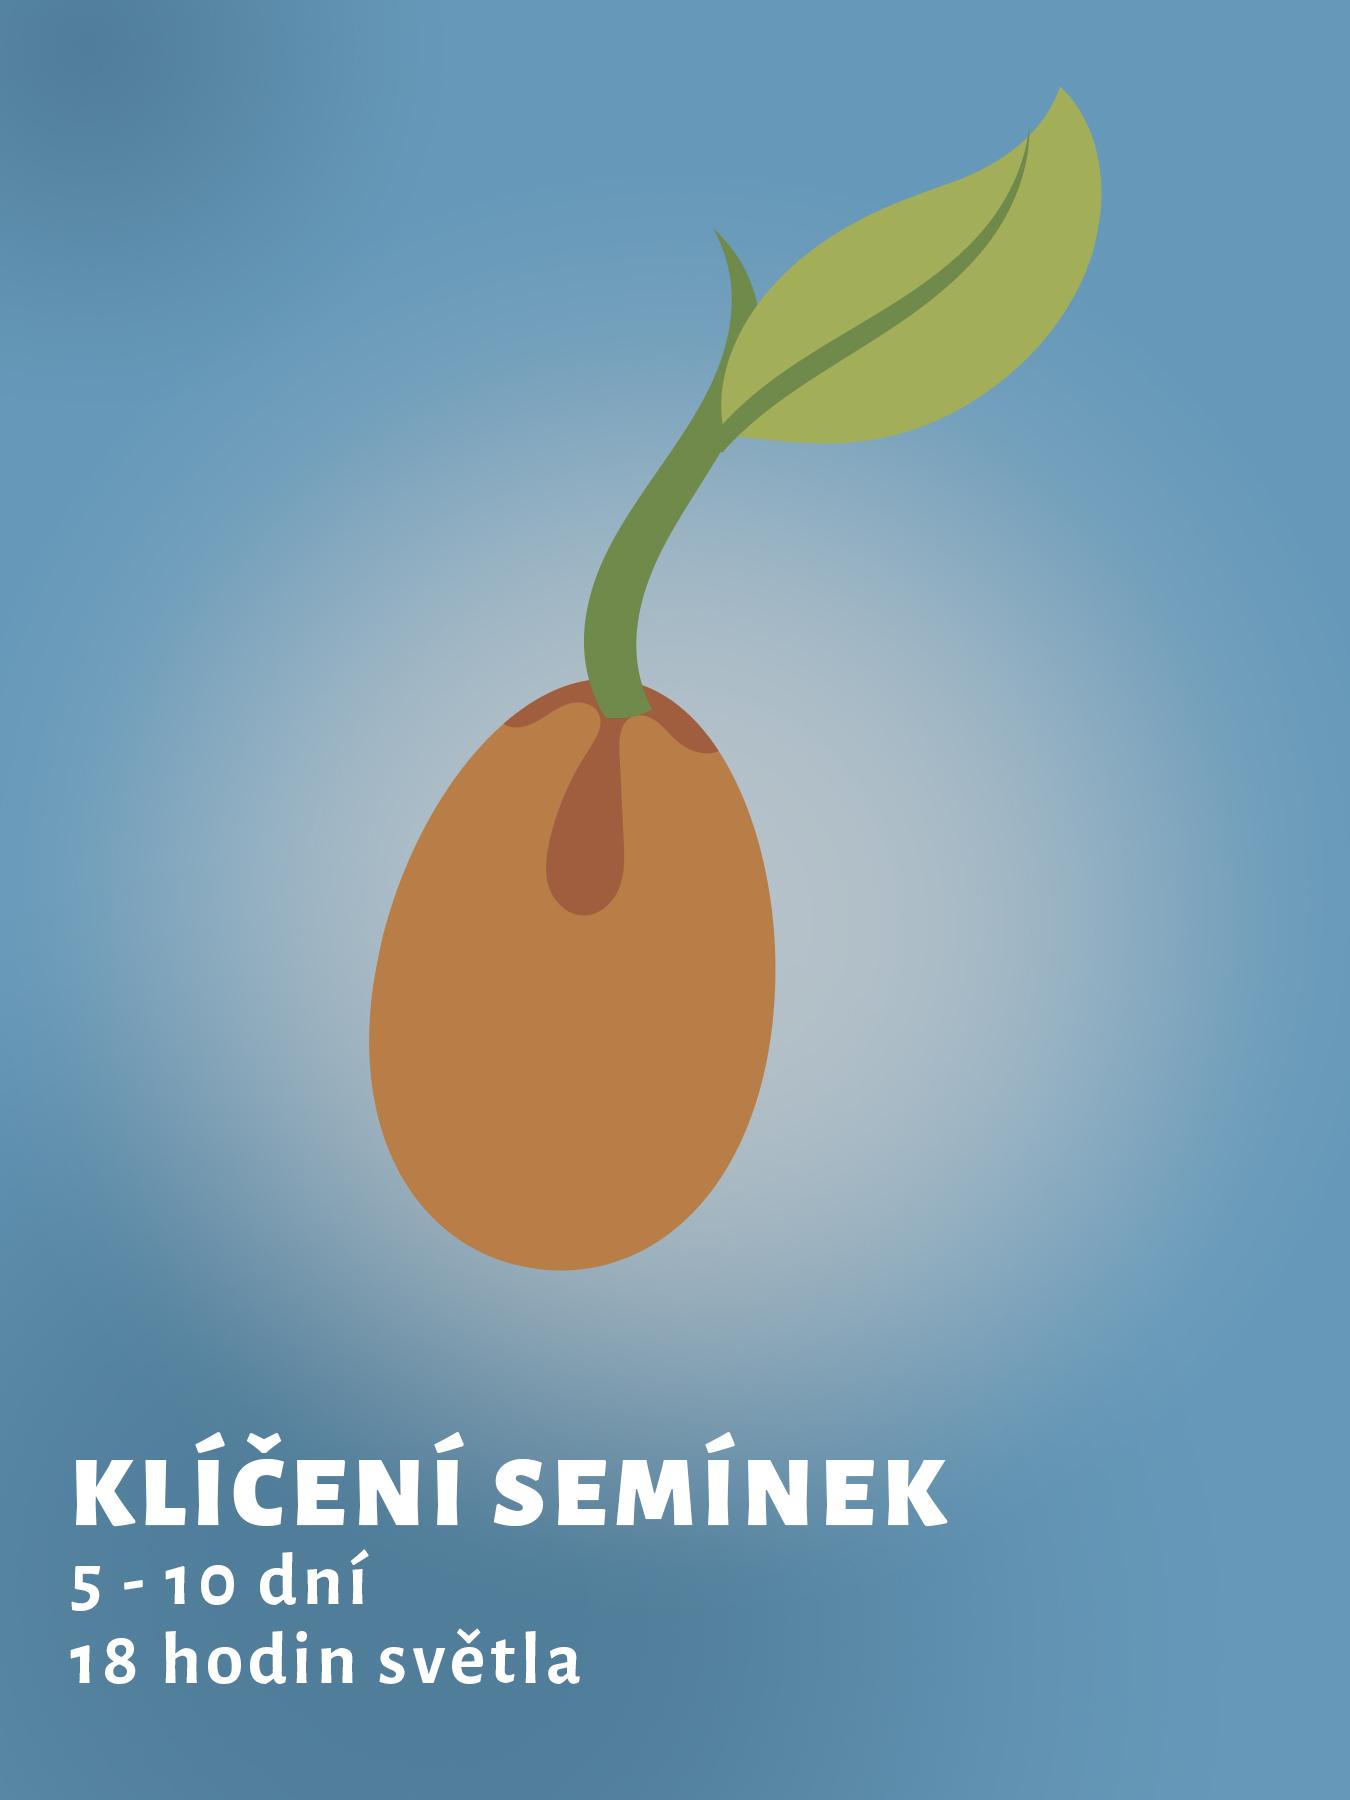 kliceni-semen-konopi_1